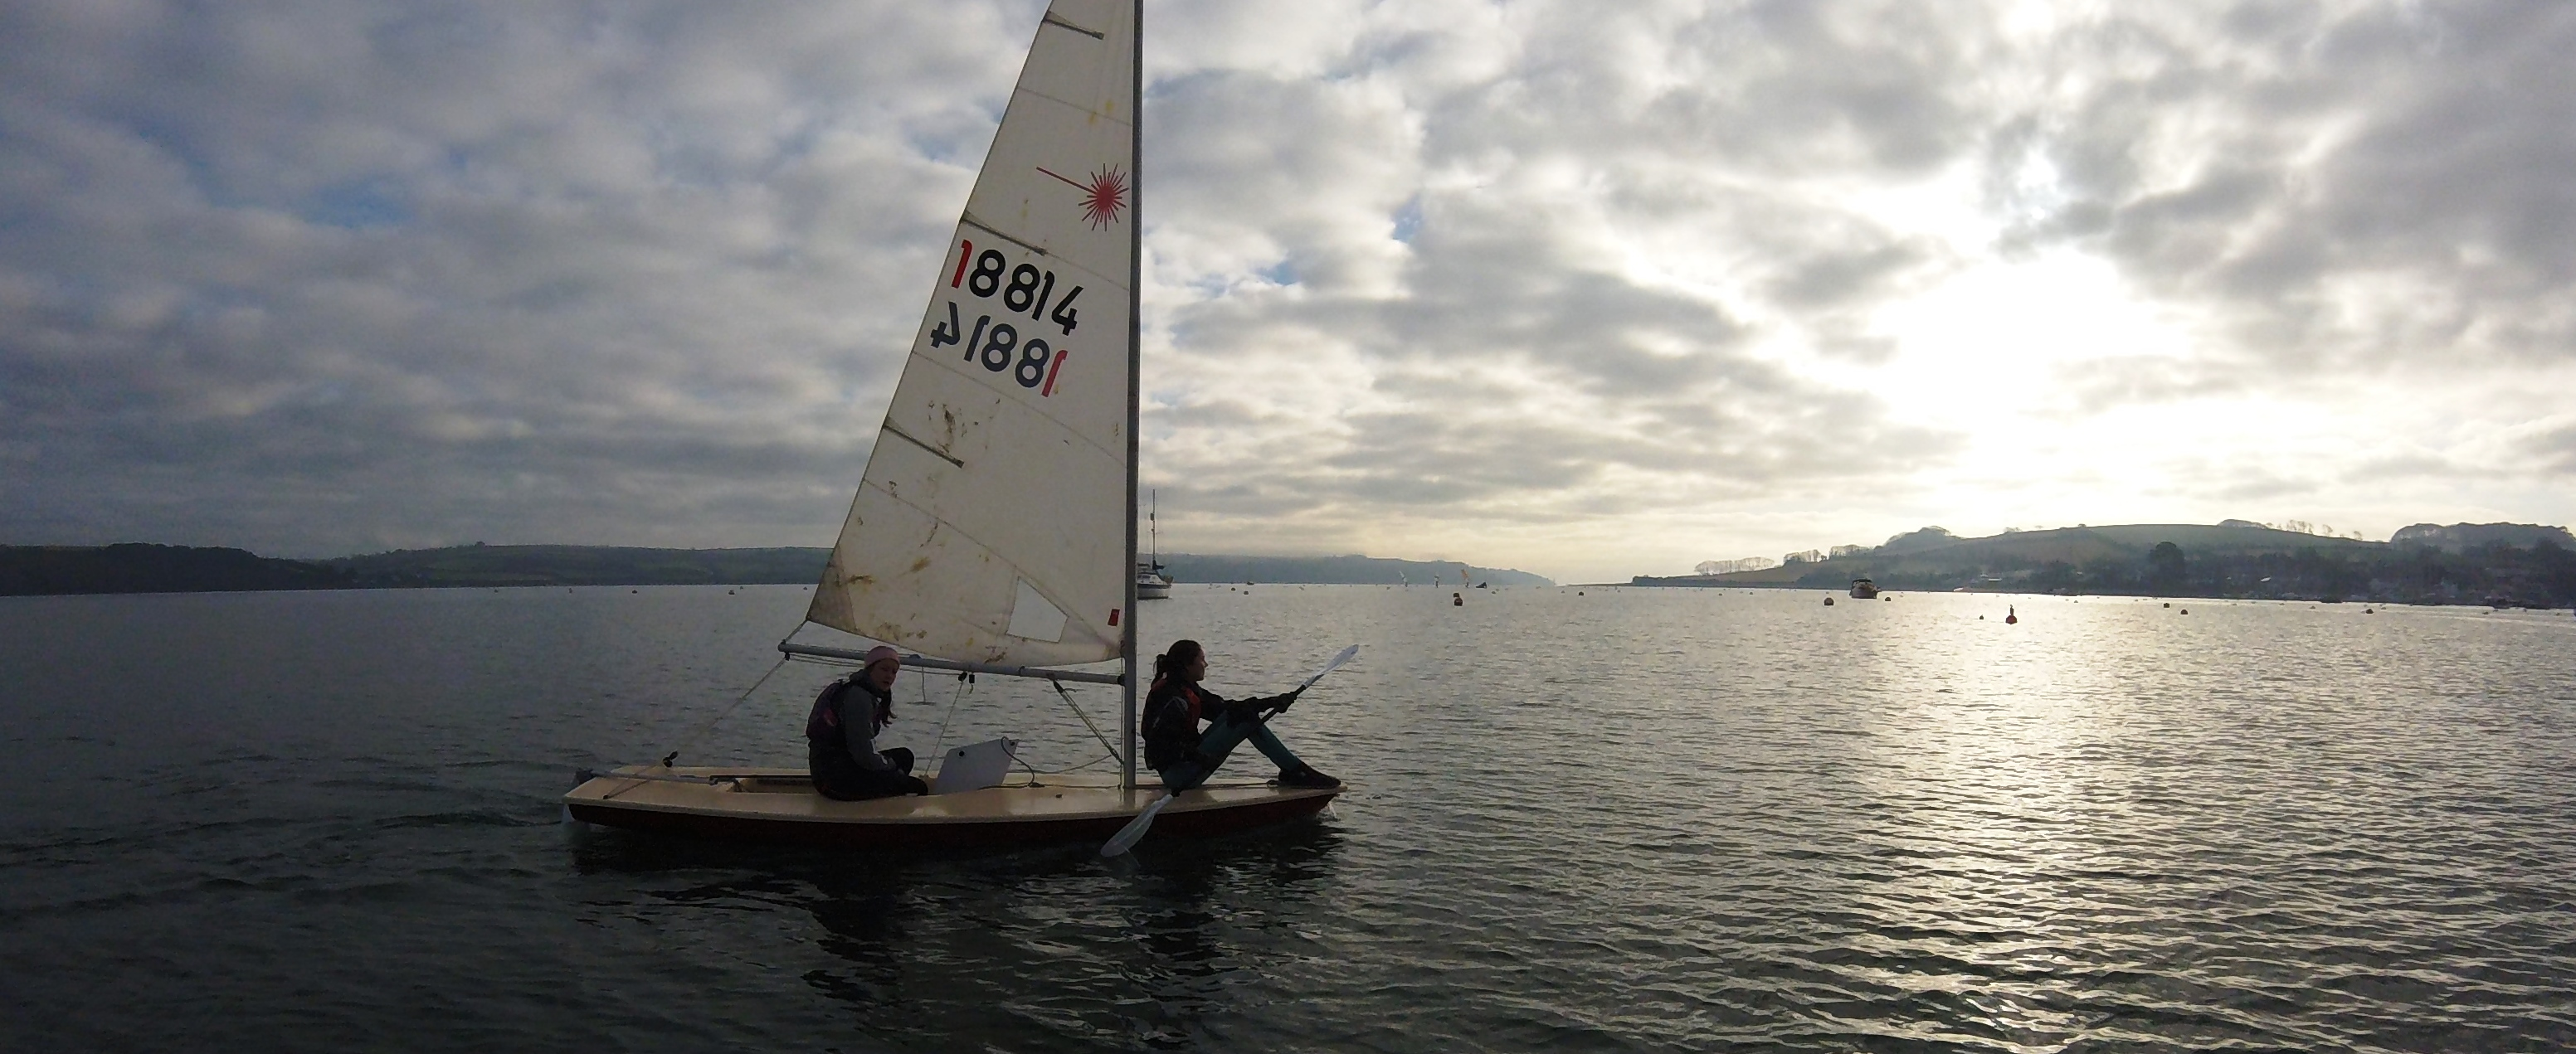 quadrathlon sailability sailing mylor falmouth